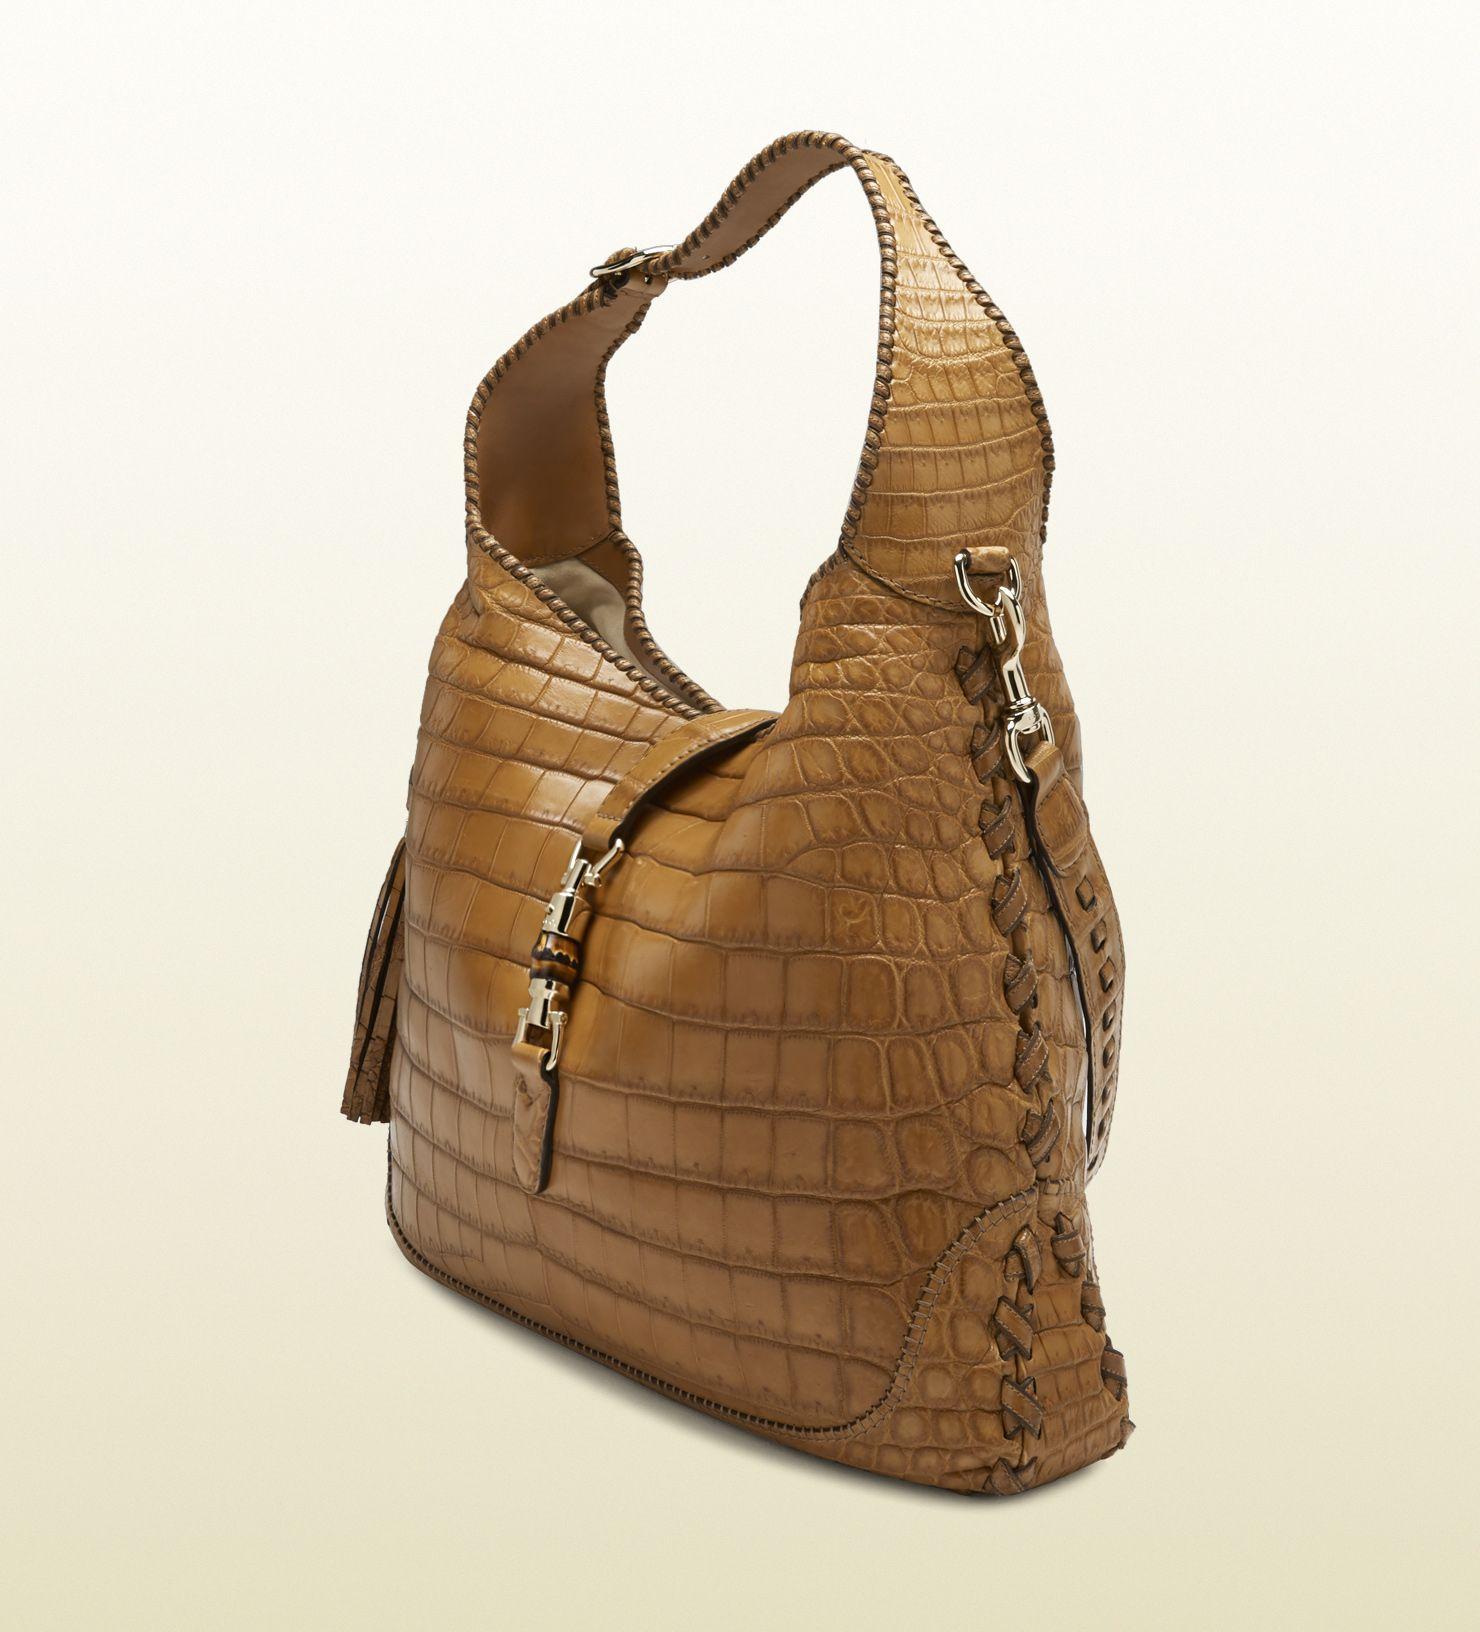 e7d1005b3dd Gucci New Jackie Crocodile Shoulder Bag in Brown (natural)